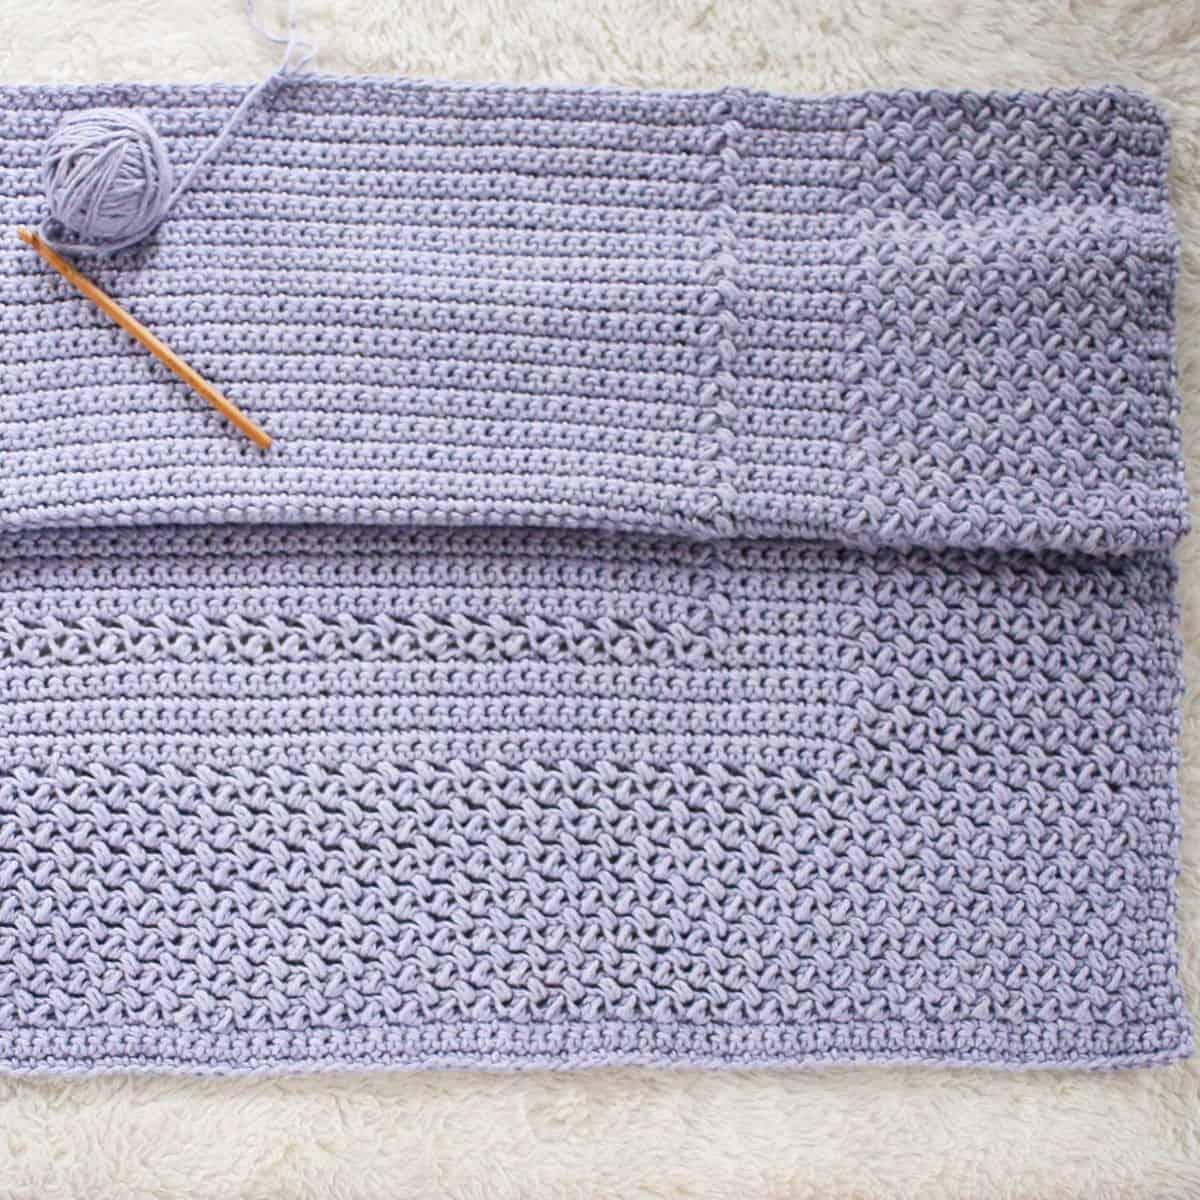 Easy Crochet Baby Blanket Free Crochet Pattern Crochet Life